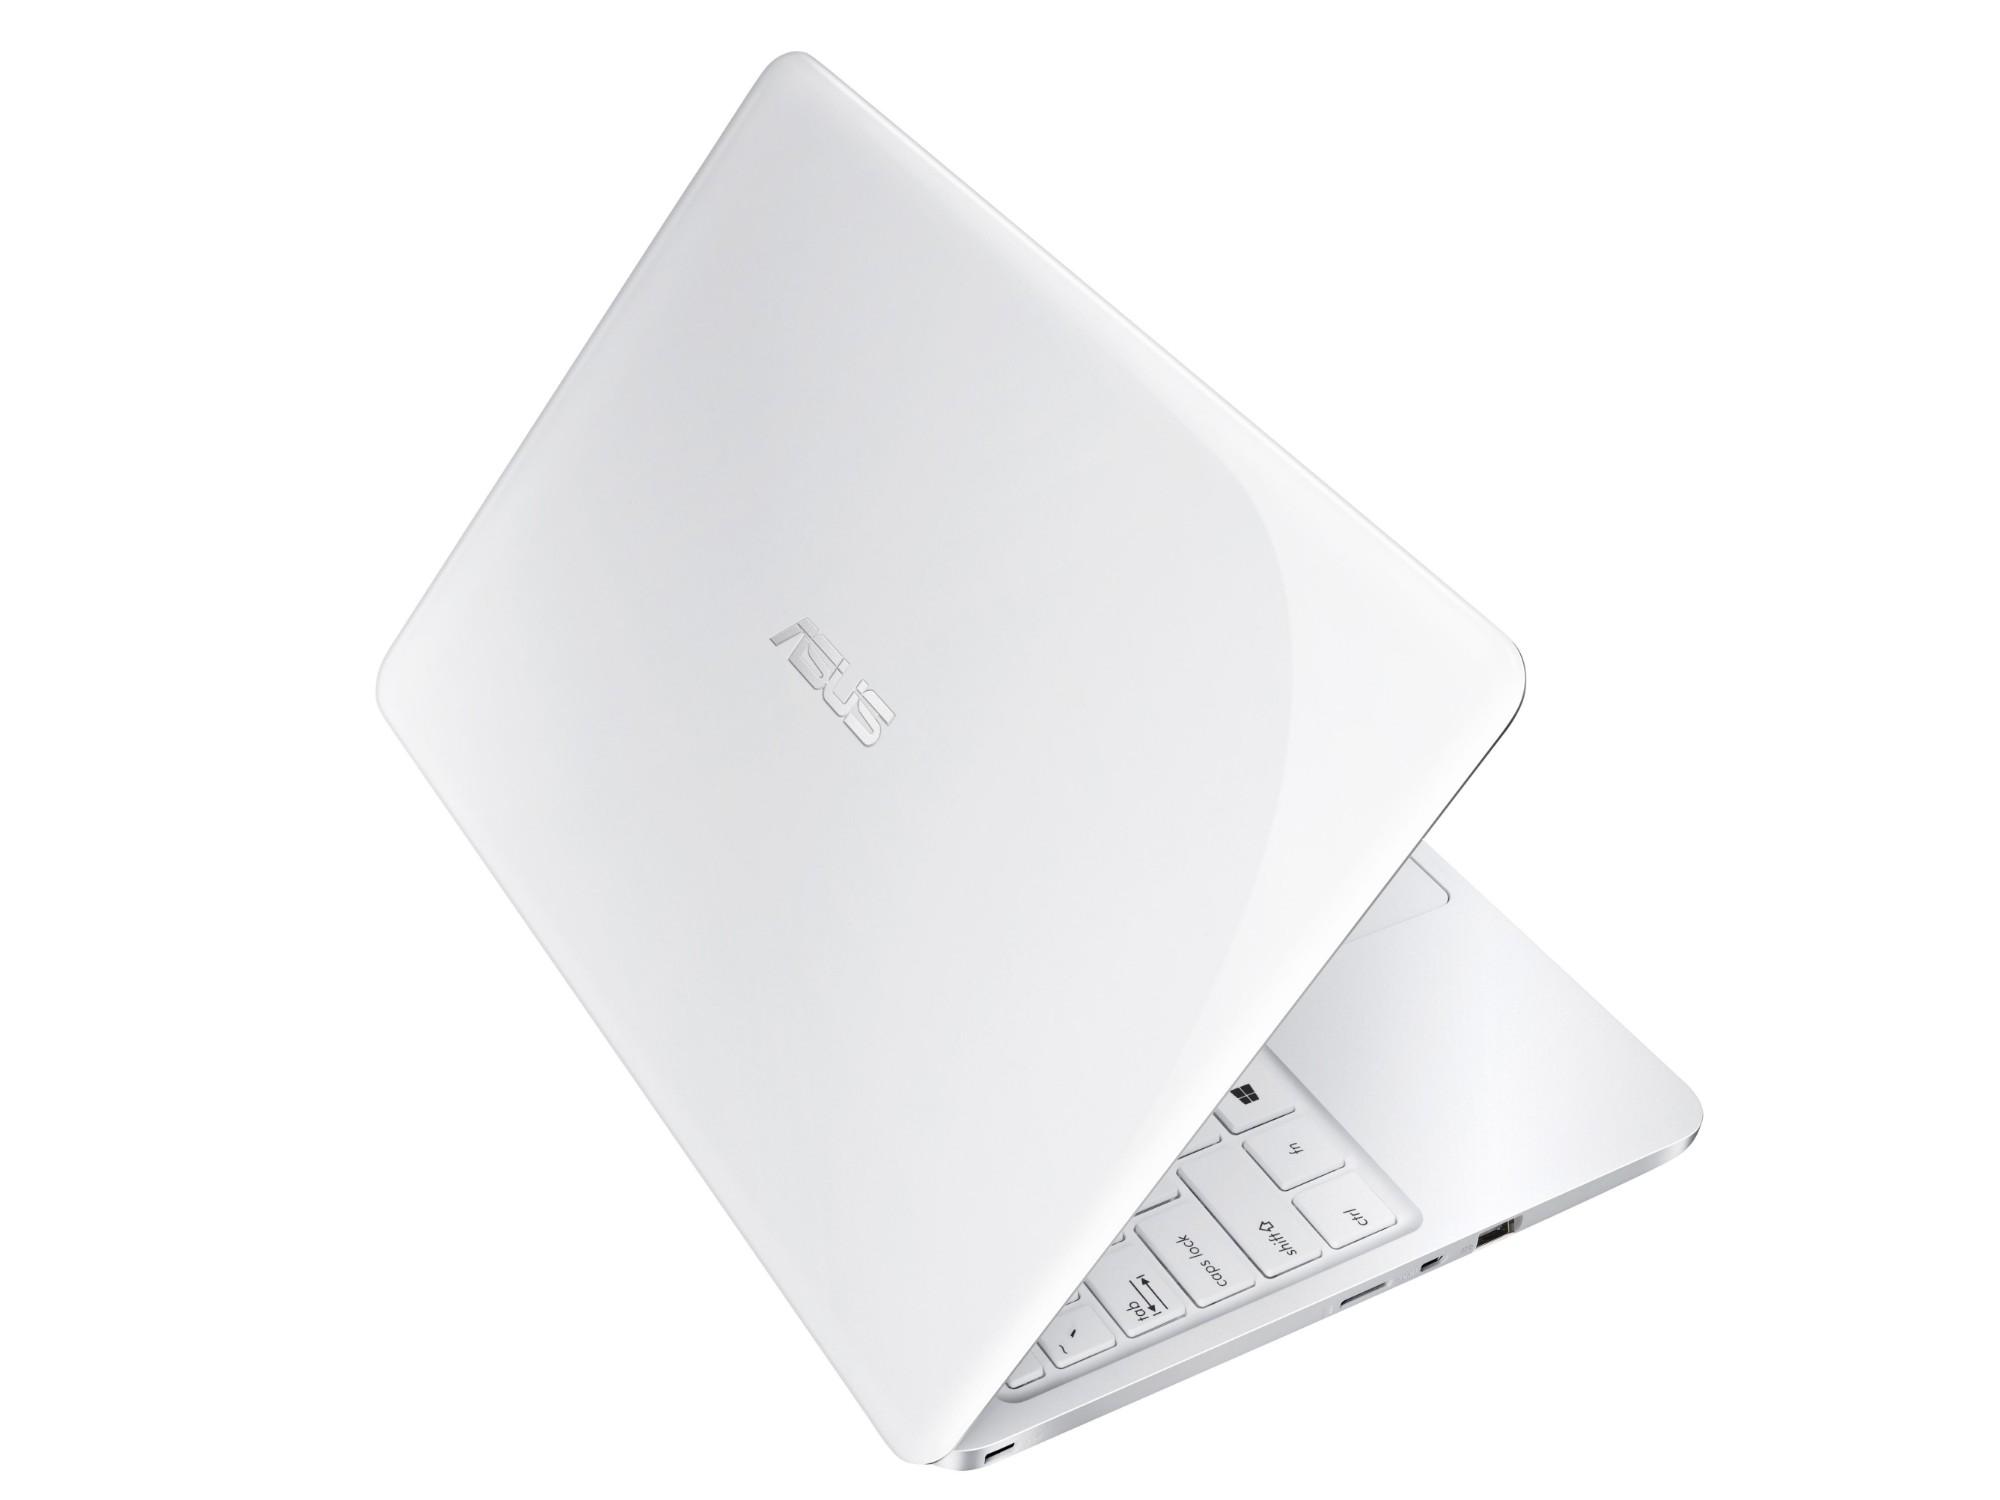 "ASUS VivoBook E200HA-FD0041TS 1.44GHz x5-Z8350 11.6"" 1366 x 768pixels White Notebook"